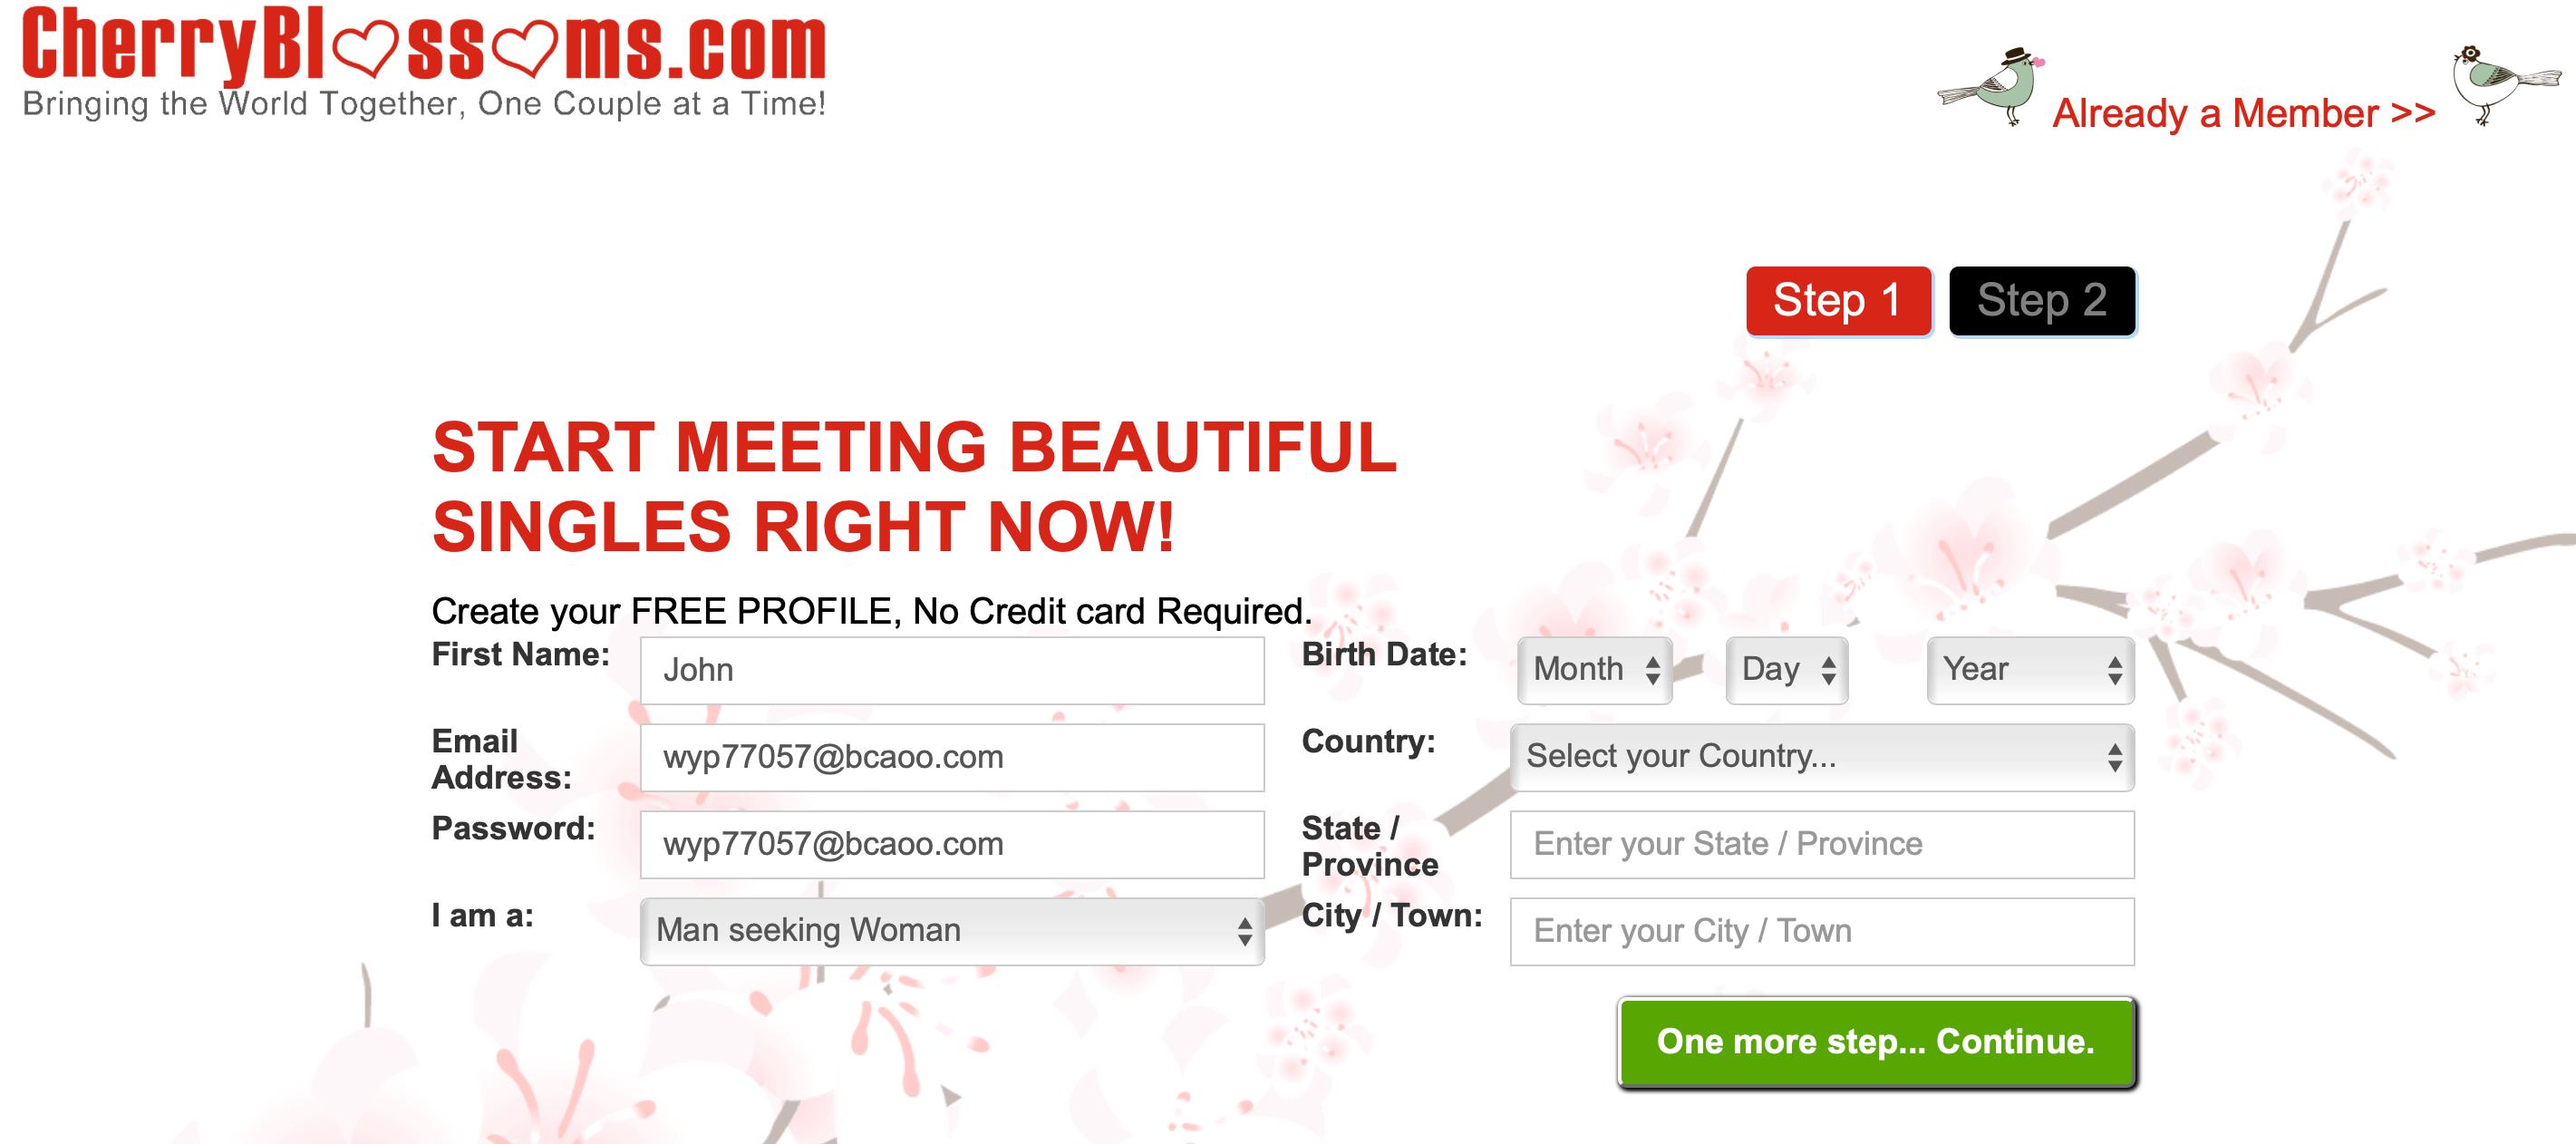 Cherry Blossoms registration